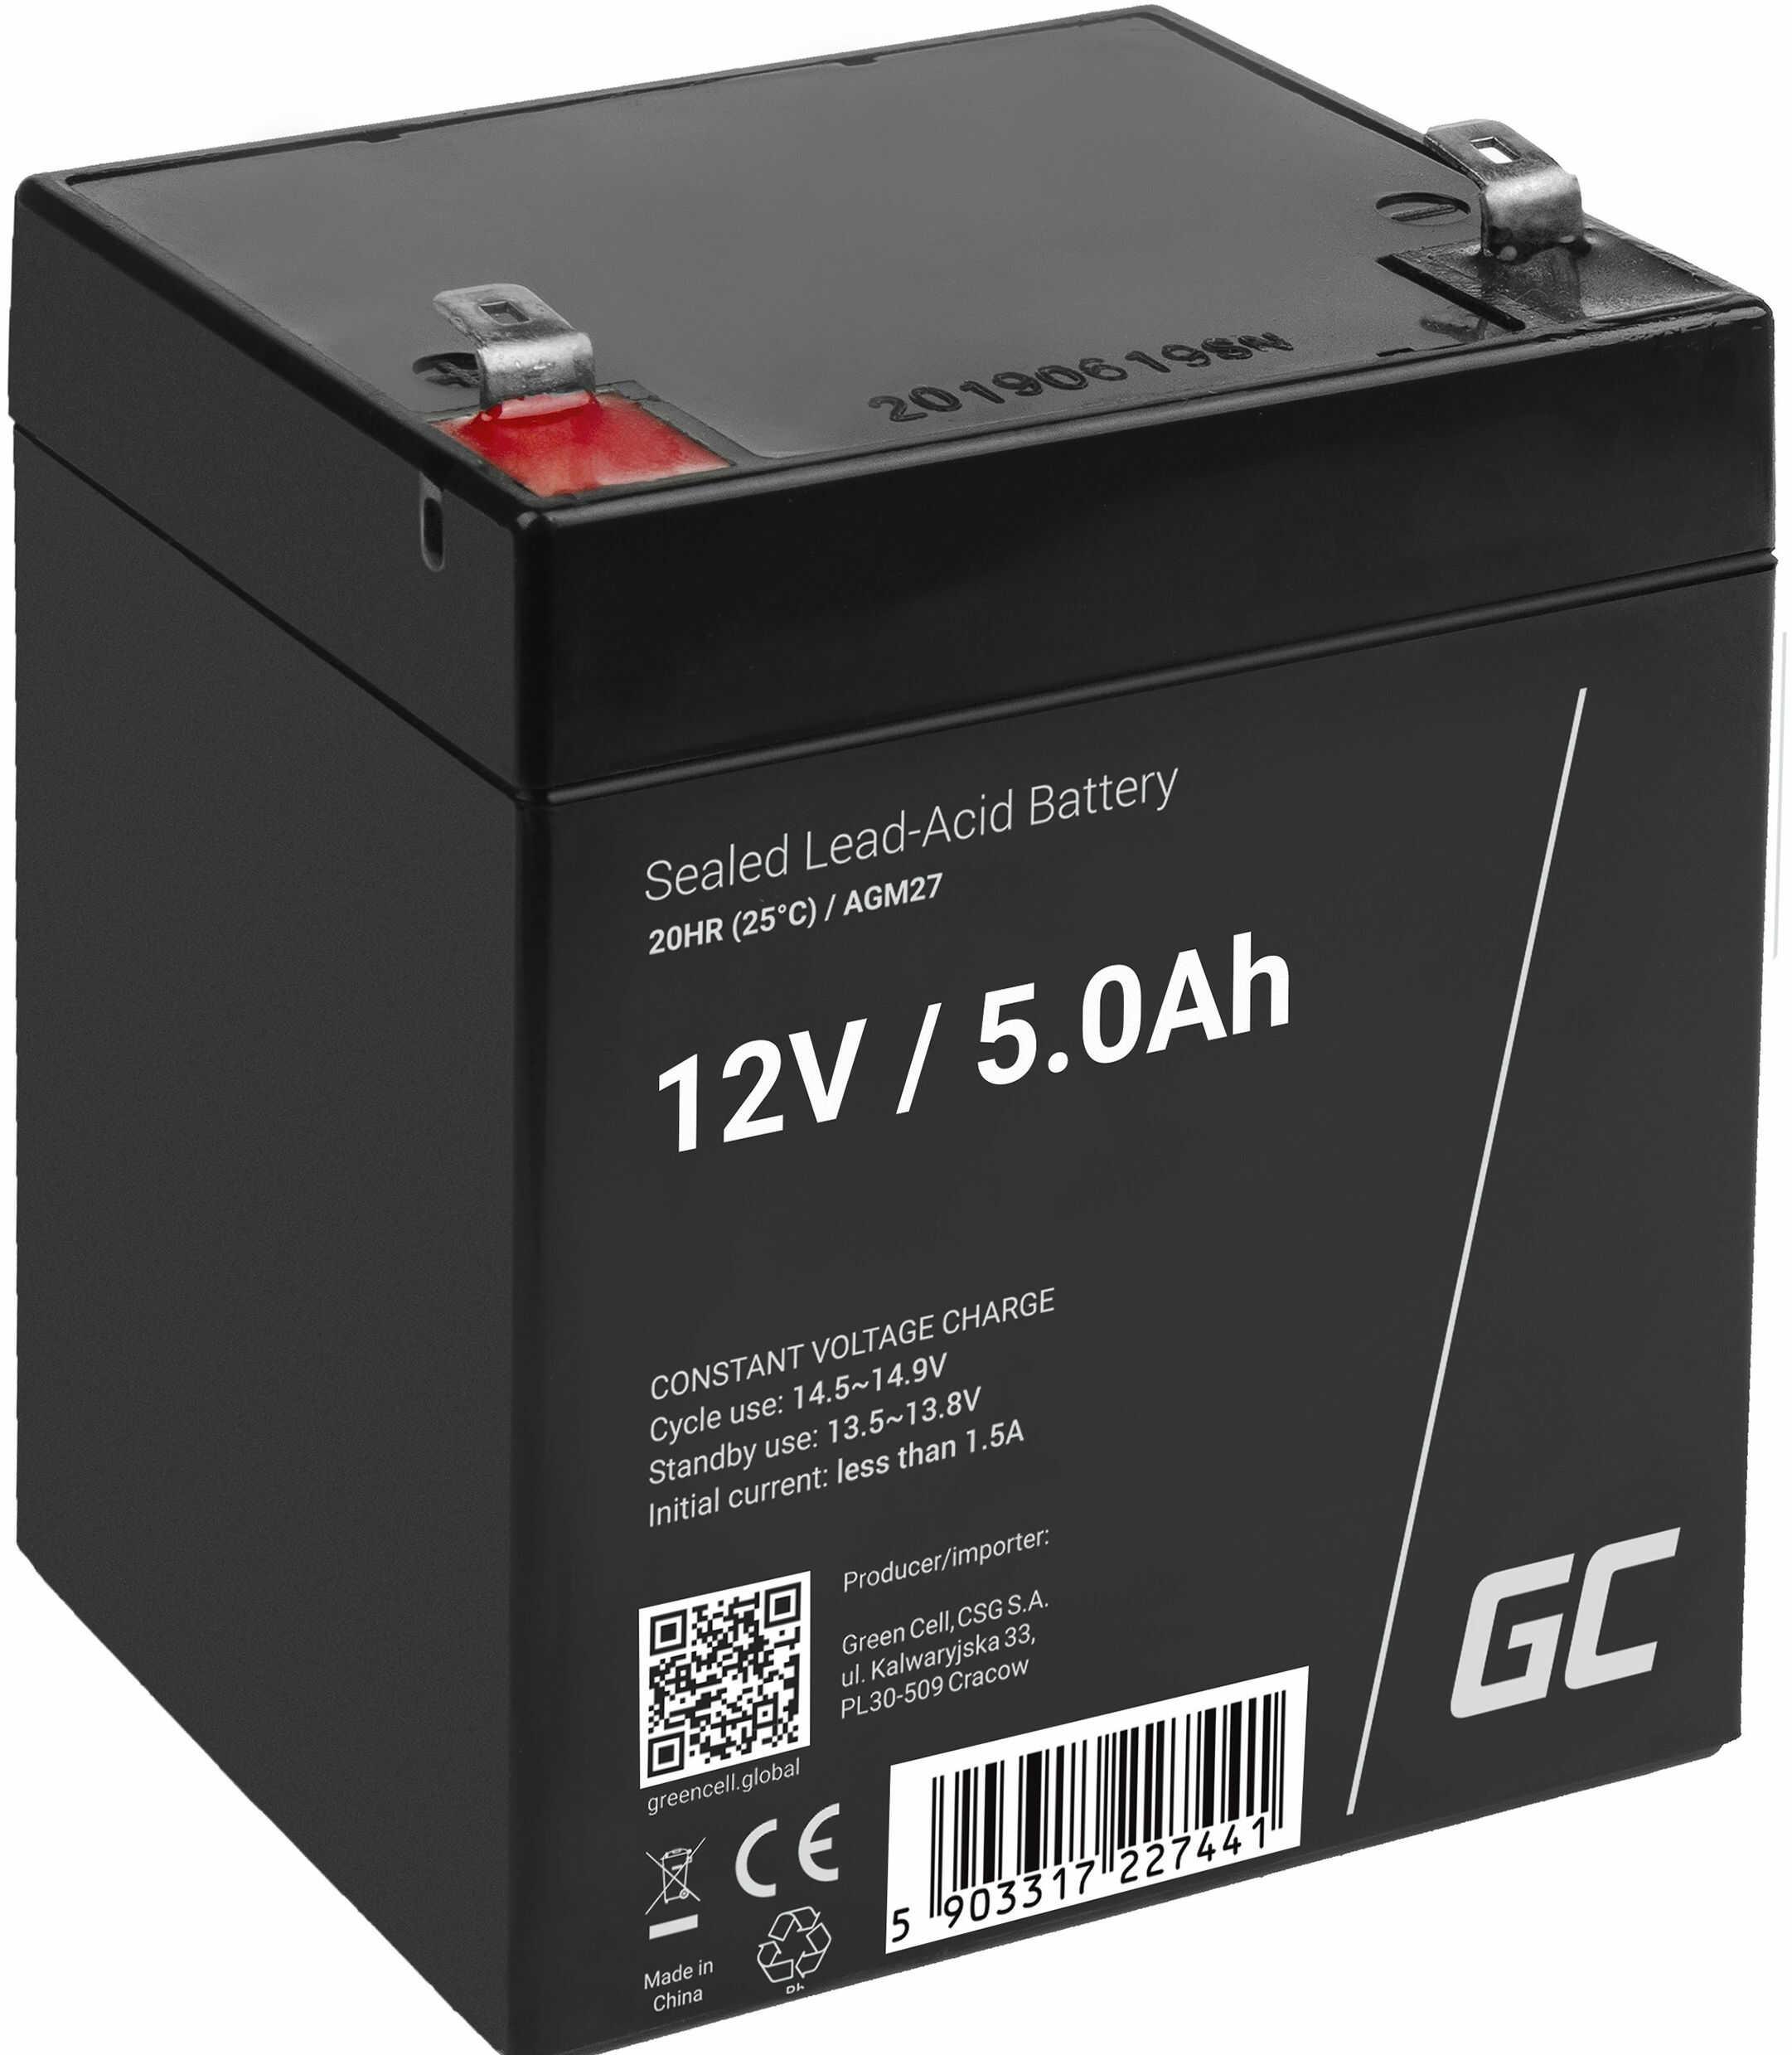 Green Cell AGM VRLA 12V 5Ah bezobsługowy akumulator do systemu alarmowego kasy fiskalnej zabawki